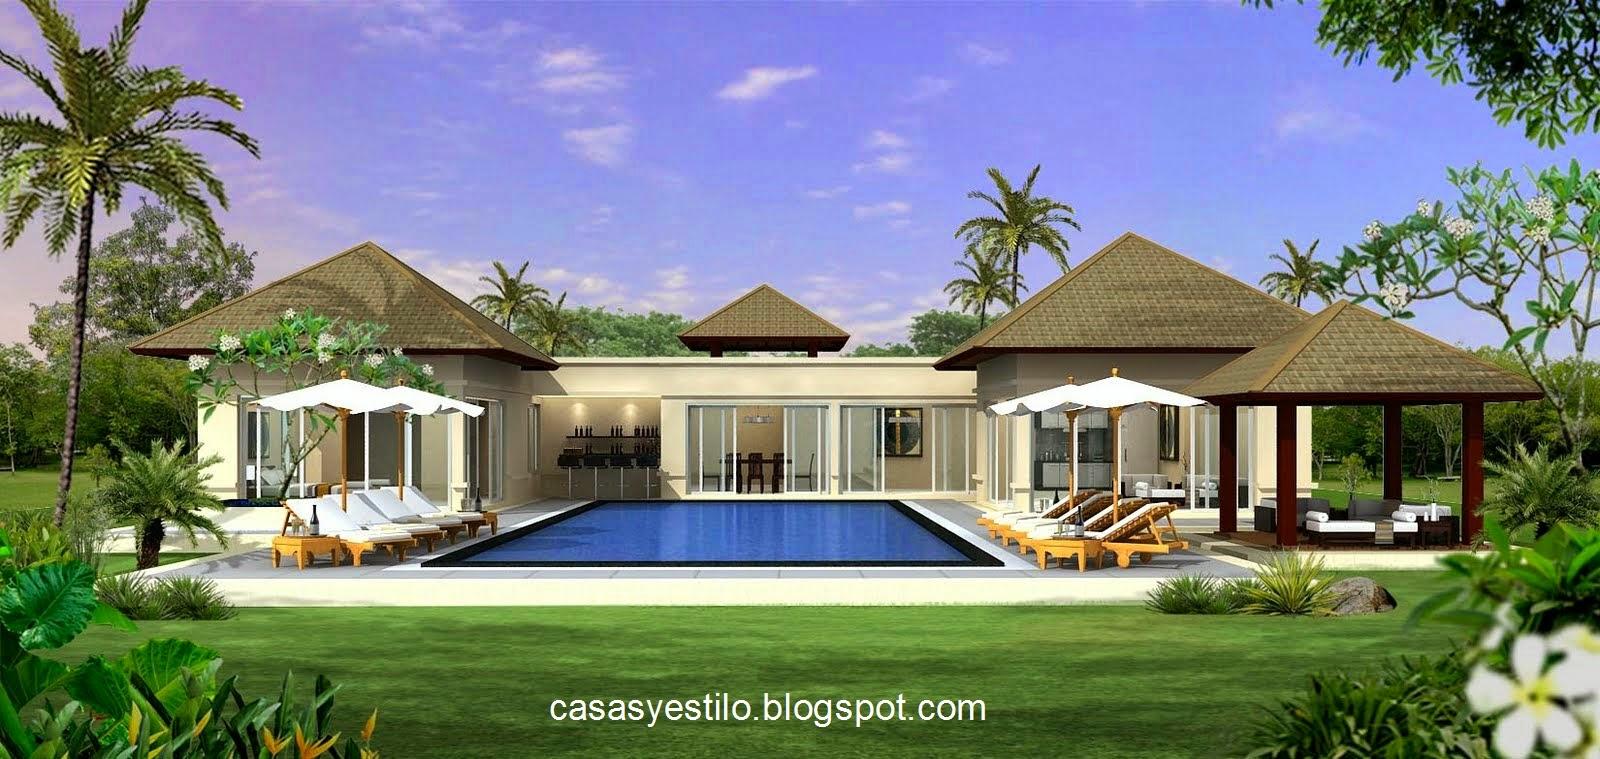 Casas grandes con piscina casas y estilo for Patios de casas modernas con piscina